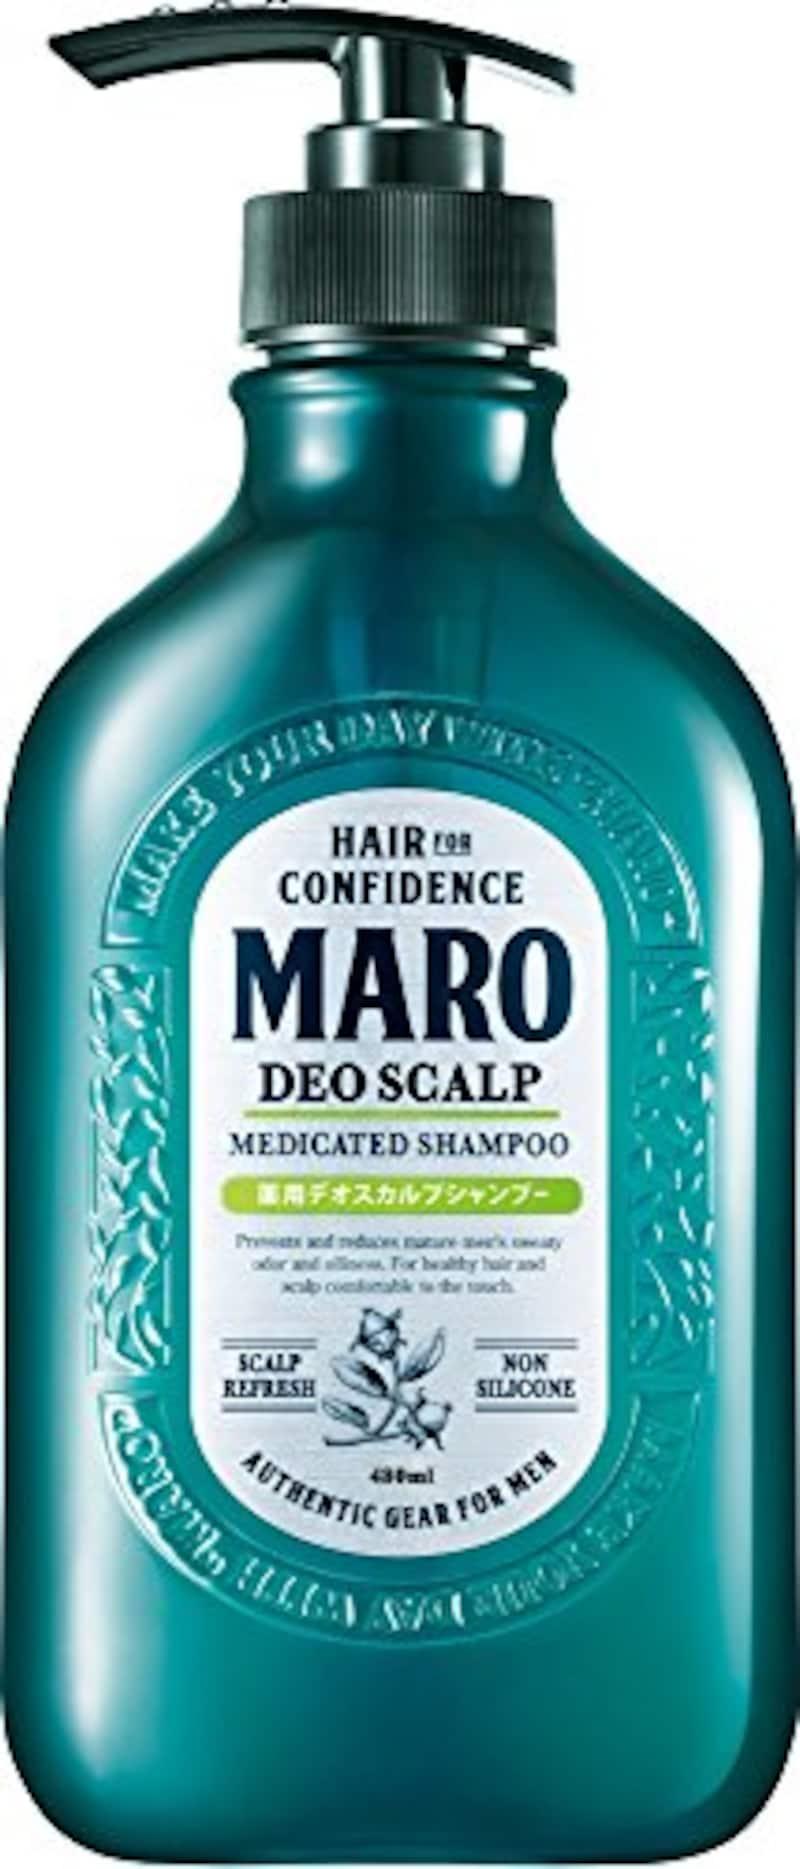 MARO(マーロ),薬用 デオスカルプシャンプー